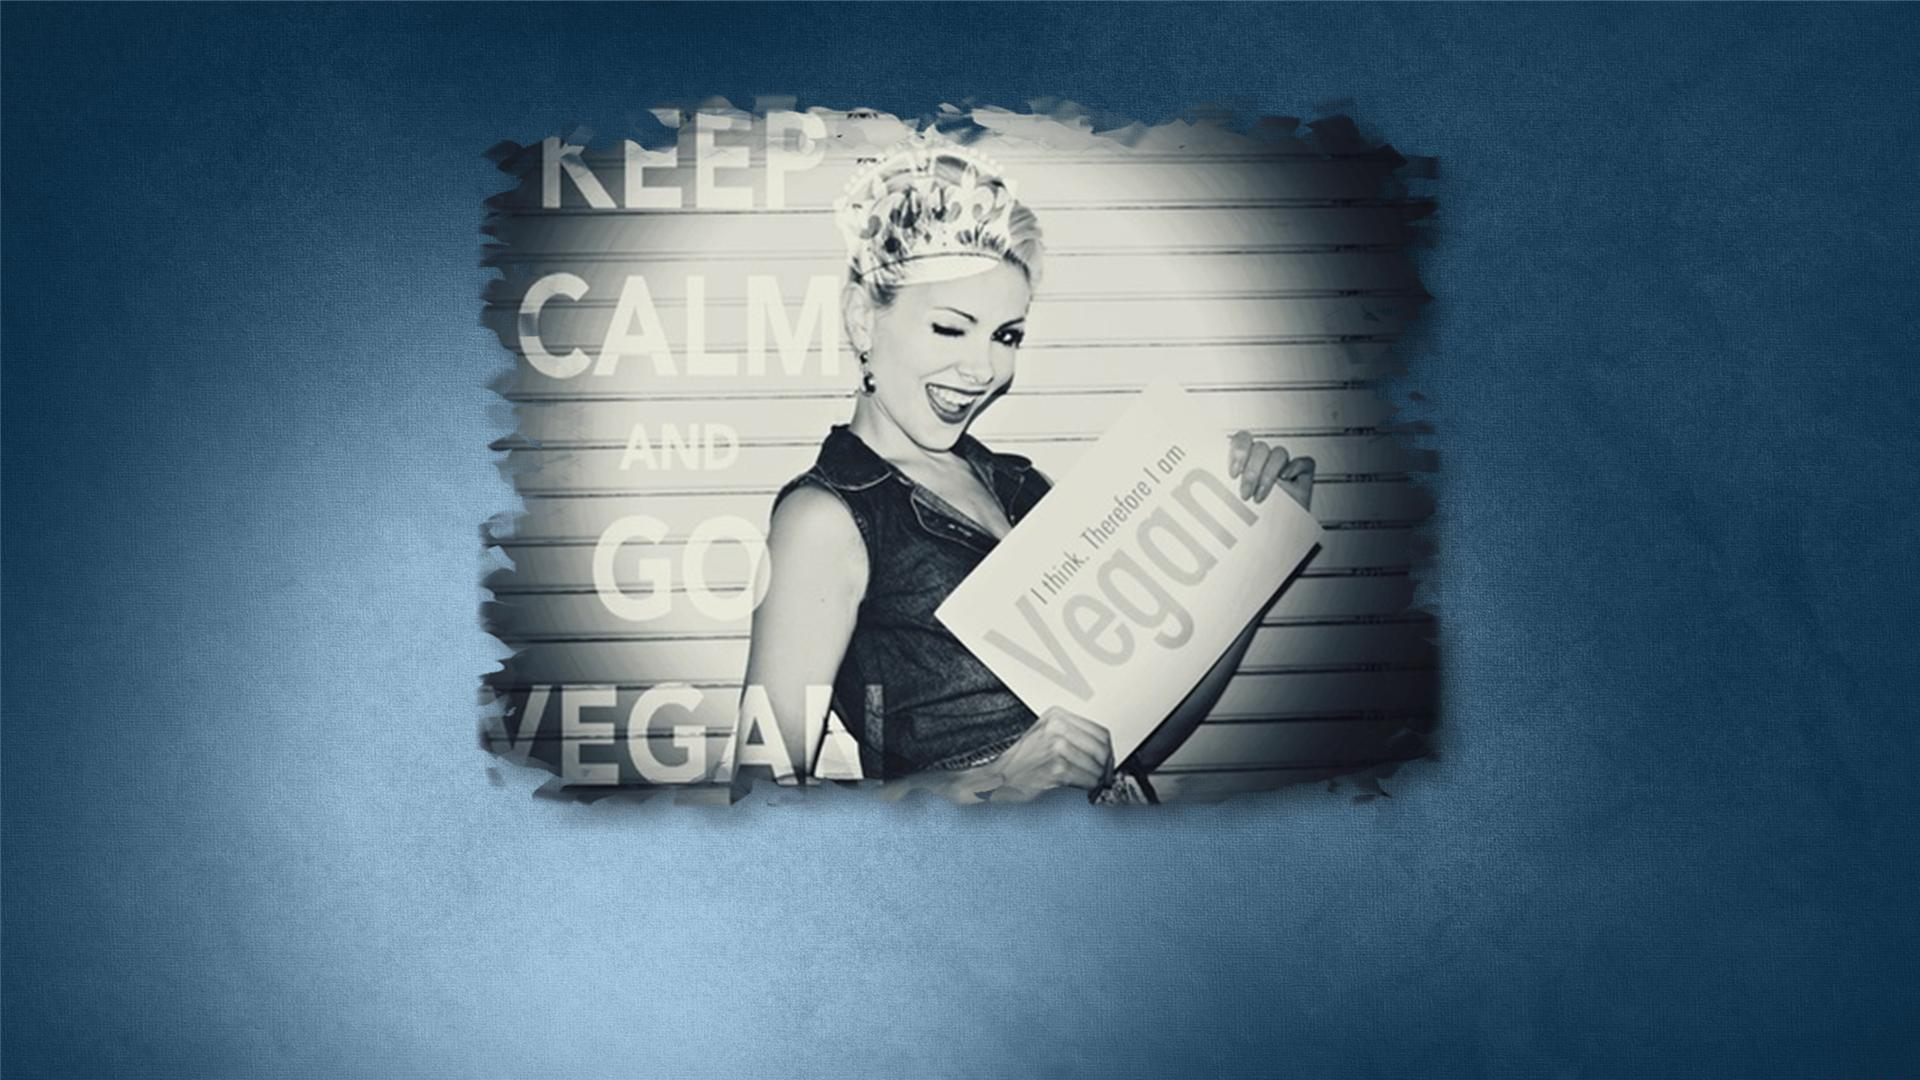 Vegan   Vegan Vegetarian Veg Girl Calm To go Keep Calm Go Veg 1920x1080